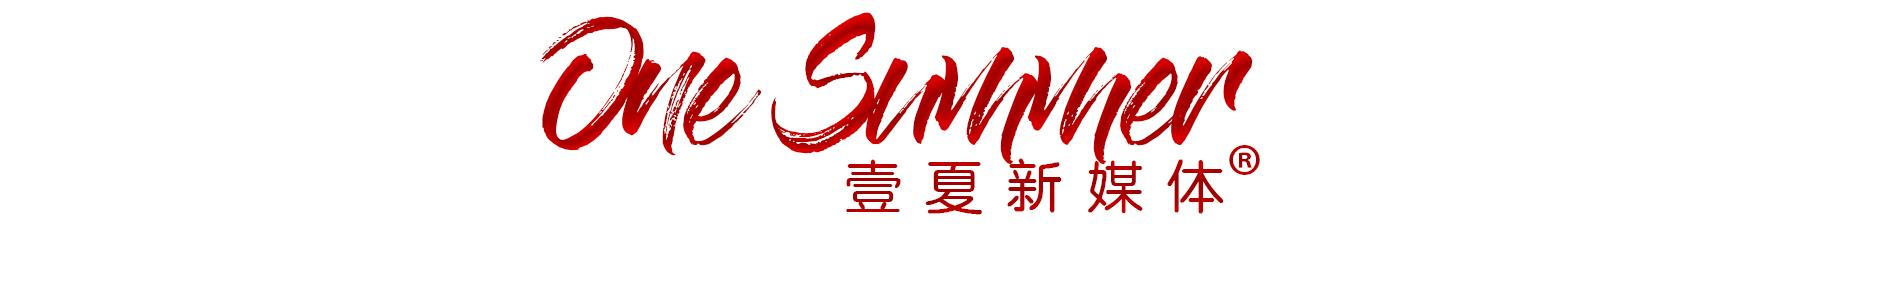 OneSummer壹夏新媒体 banner